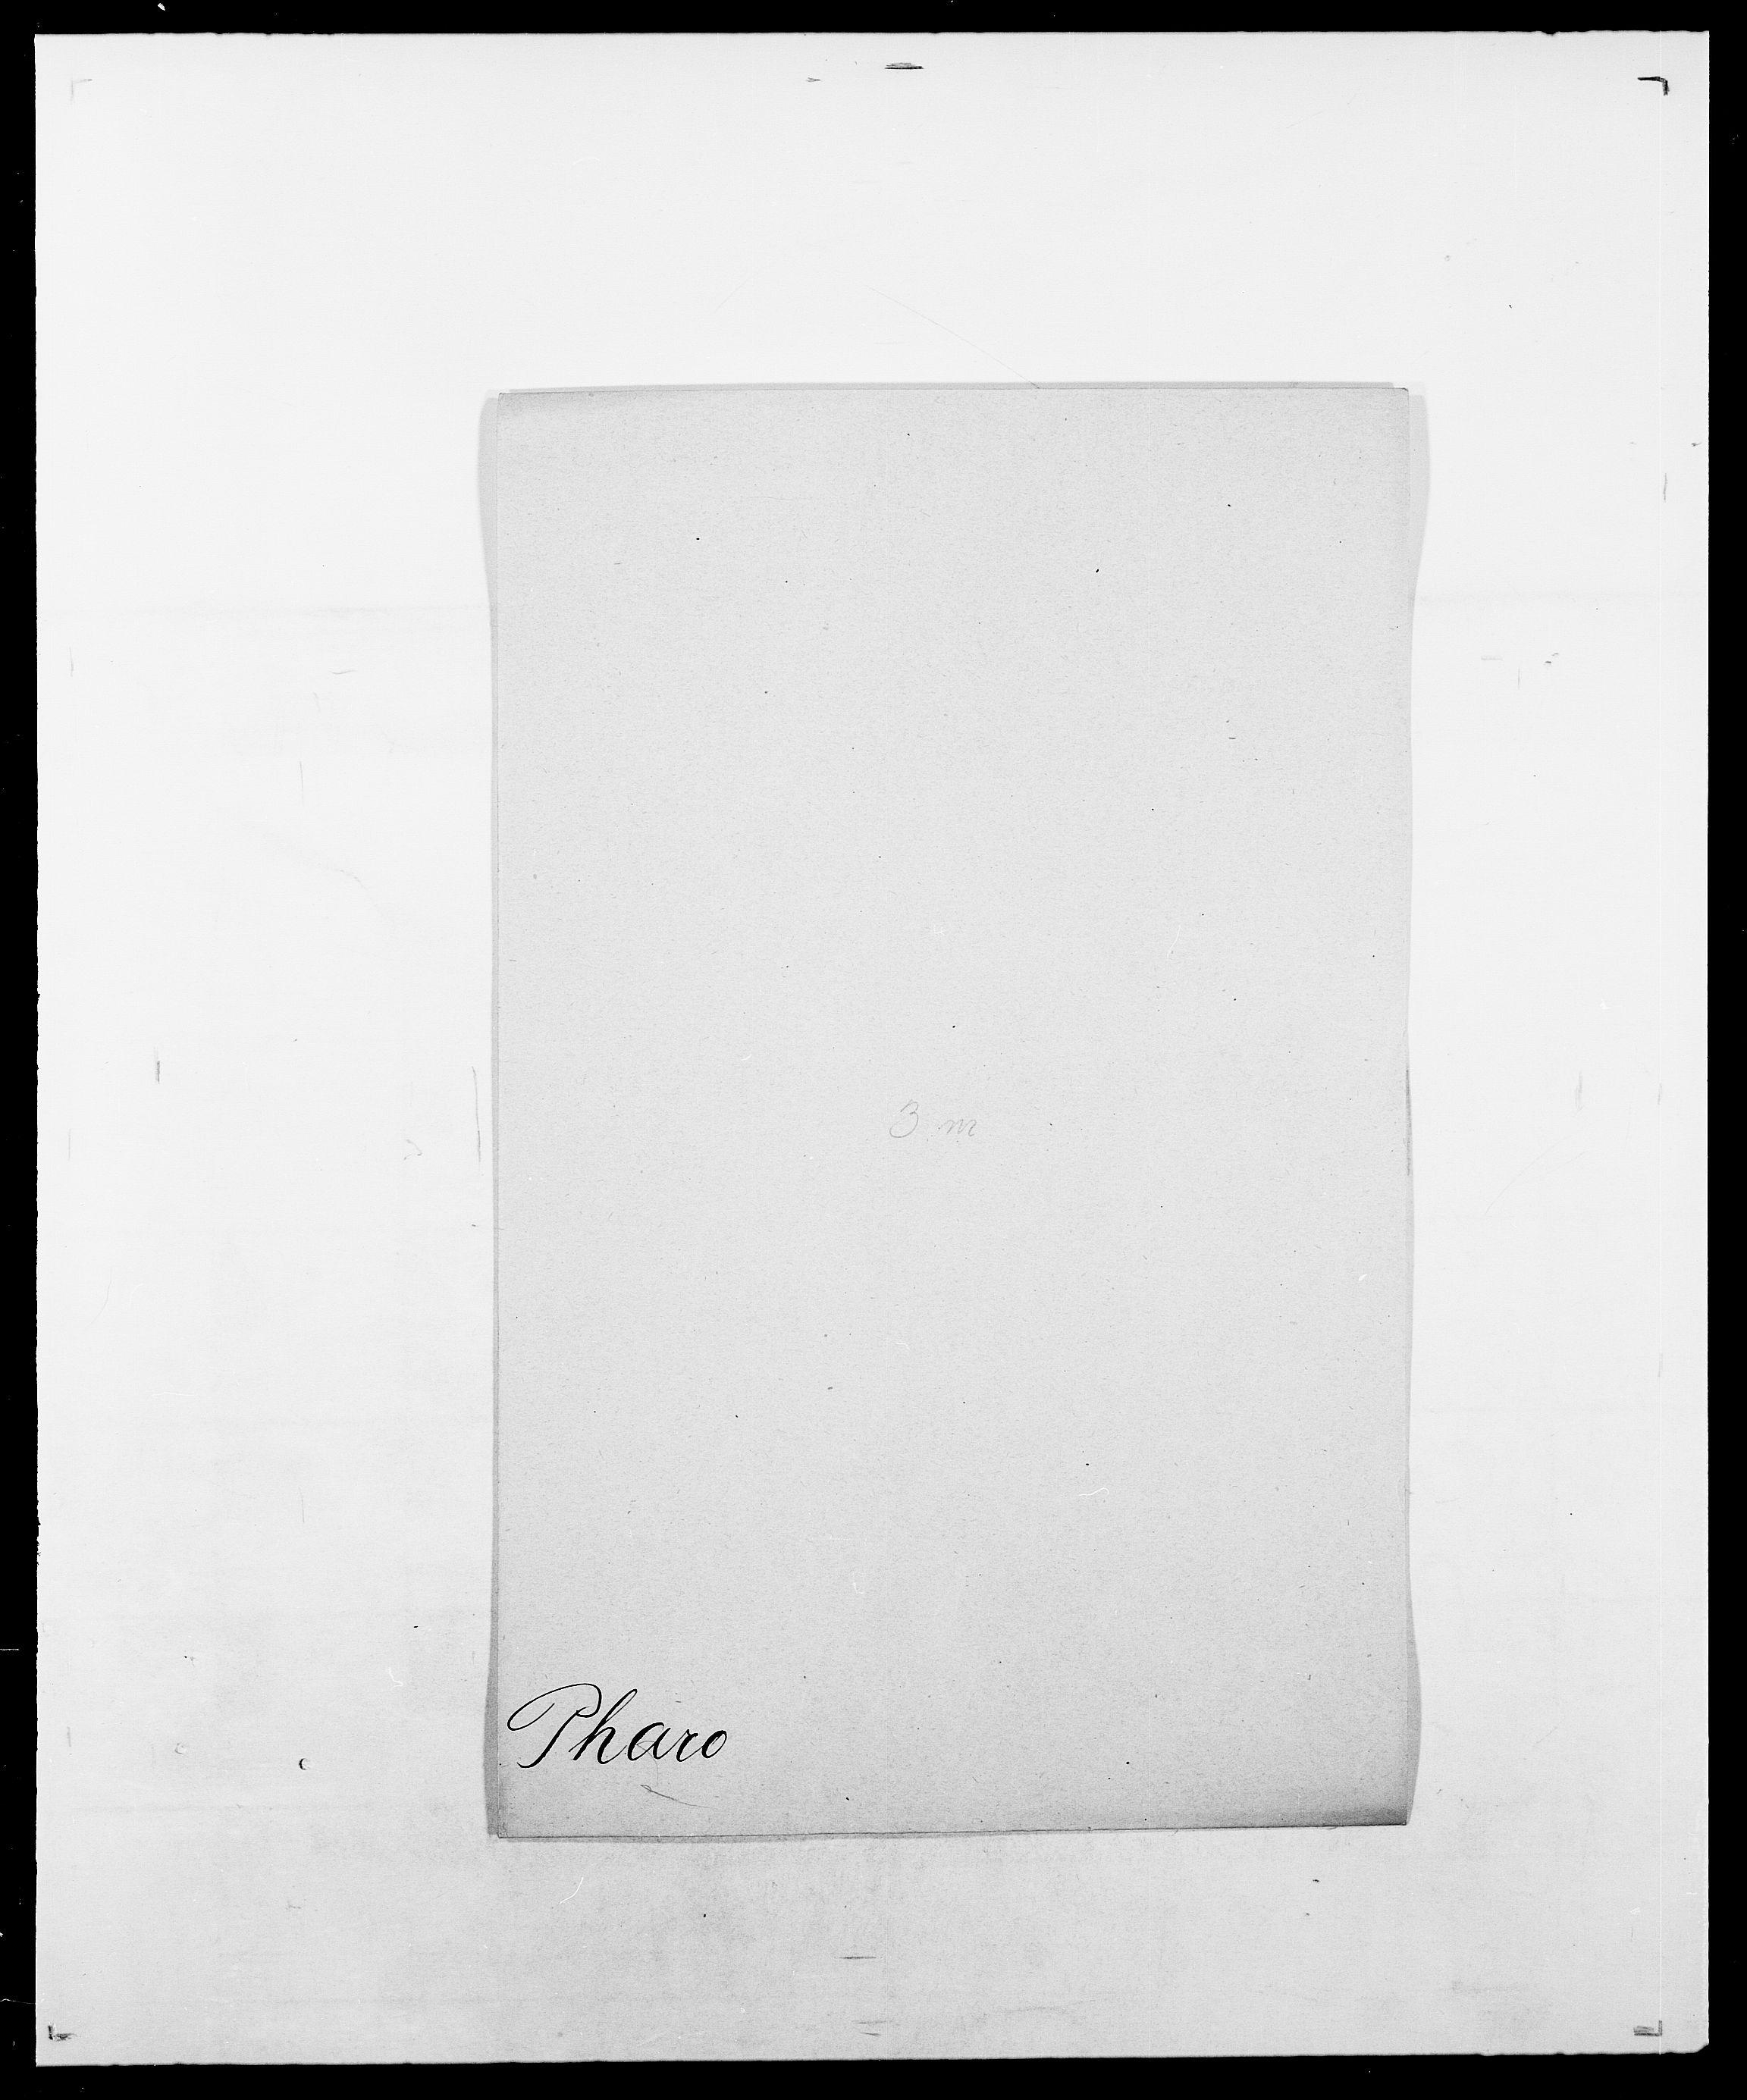 SAO, Delgobe, Charles Antoine - samling, D/Da/L0030: Paars - Pittelkov, s. 506